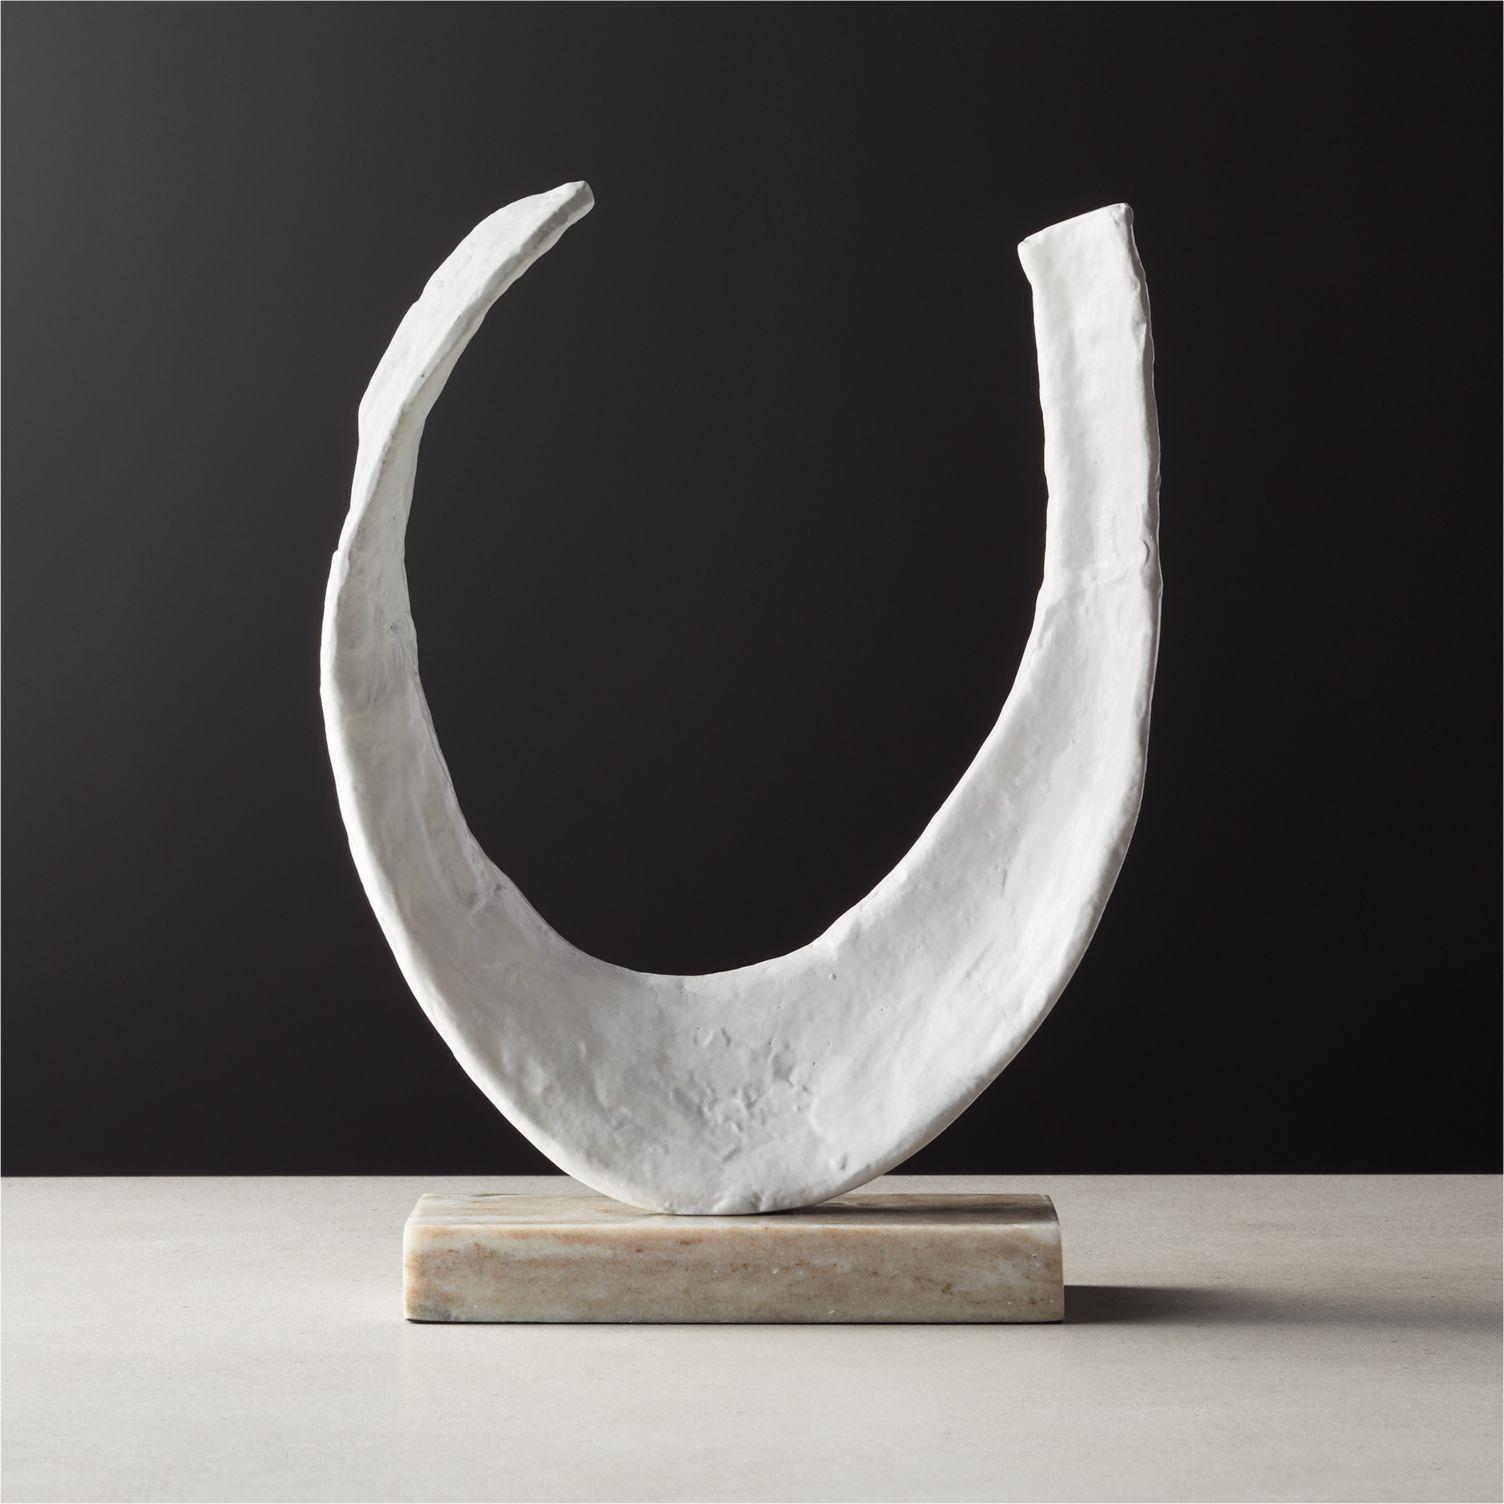 Textured-aluminum-sculpture-from-CB2-34096